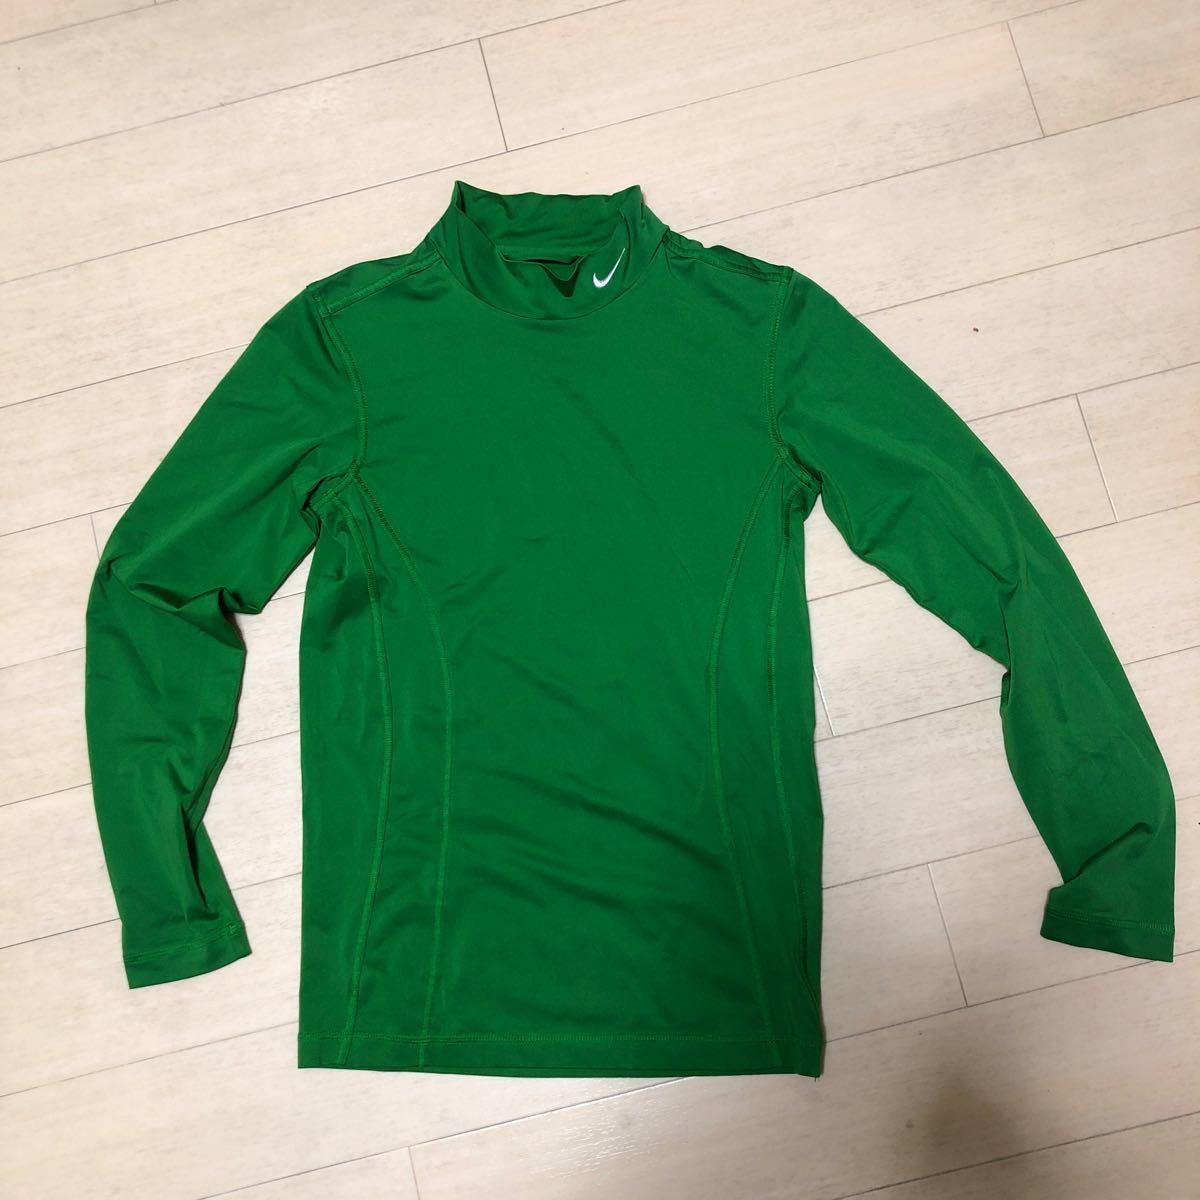 NIKEナイキ インナーシャツ  Mサイズ 着丈60cm脇袖48cm